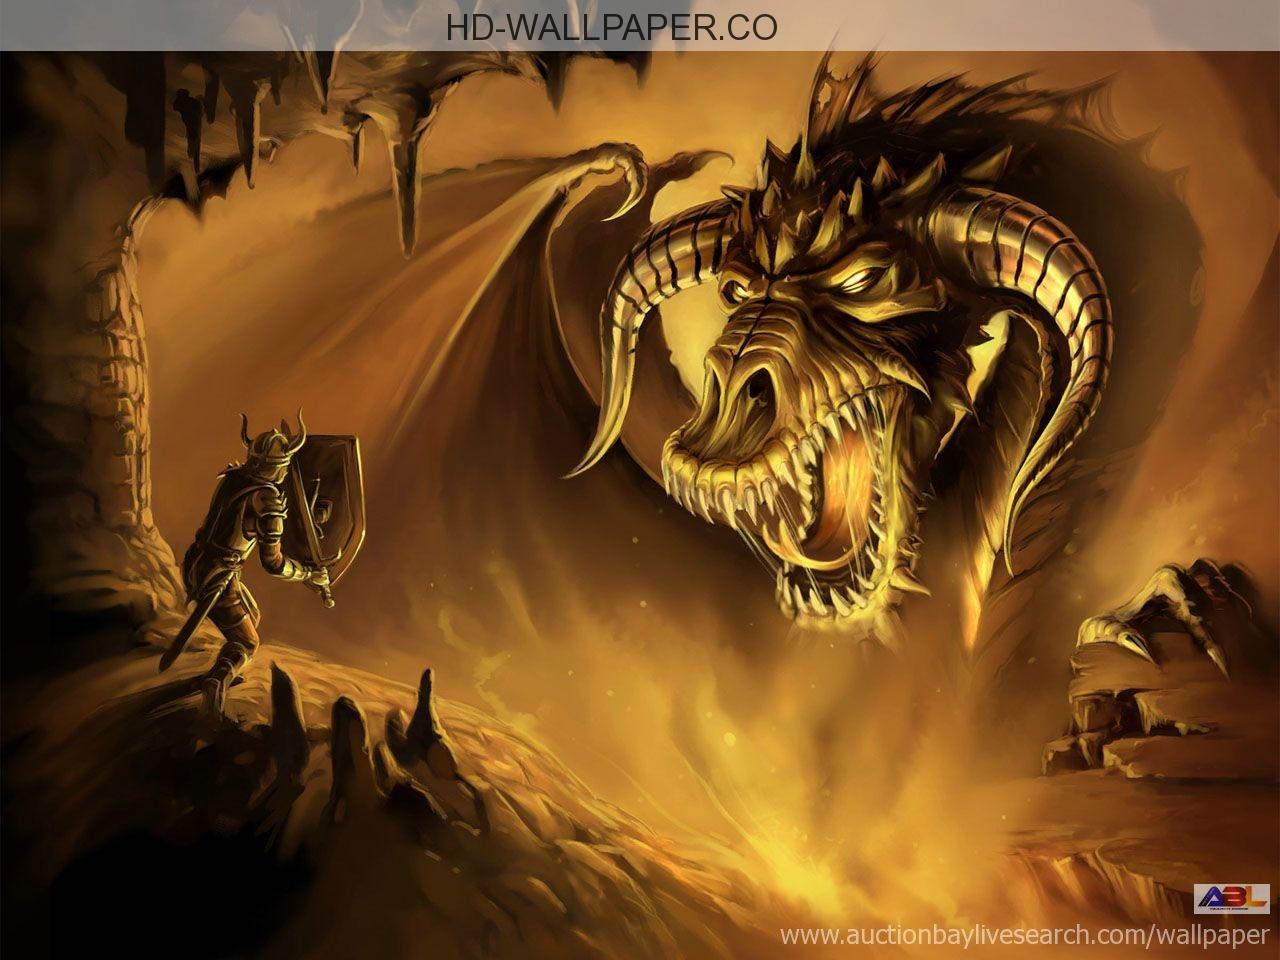 Cool Wallpaper Dragon Animated   Wallpoop   The Wallpaper Site 1280x960